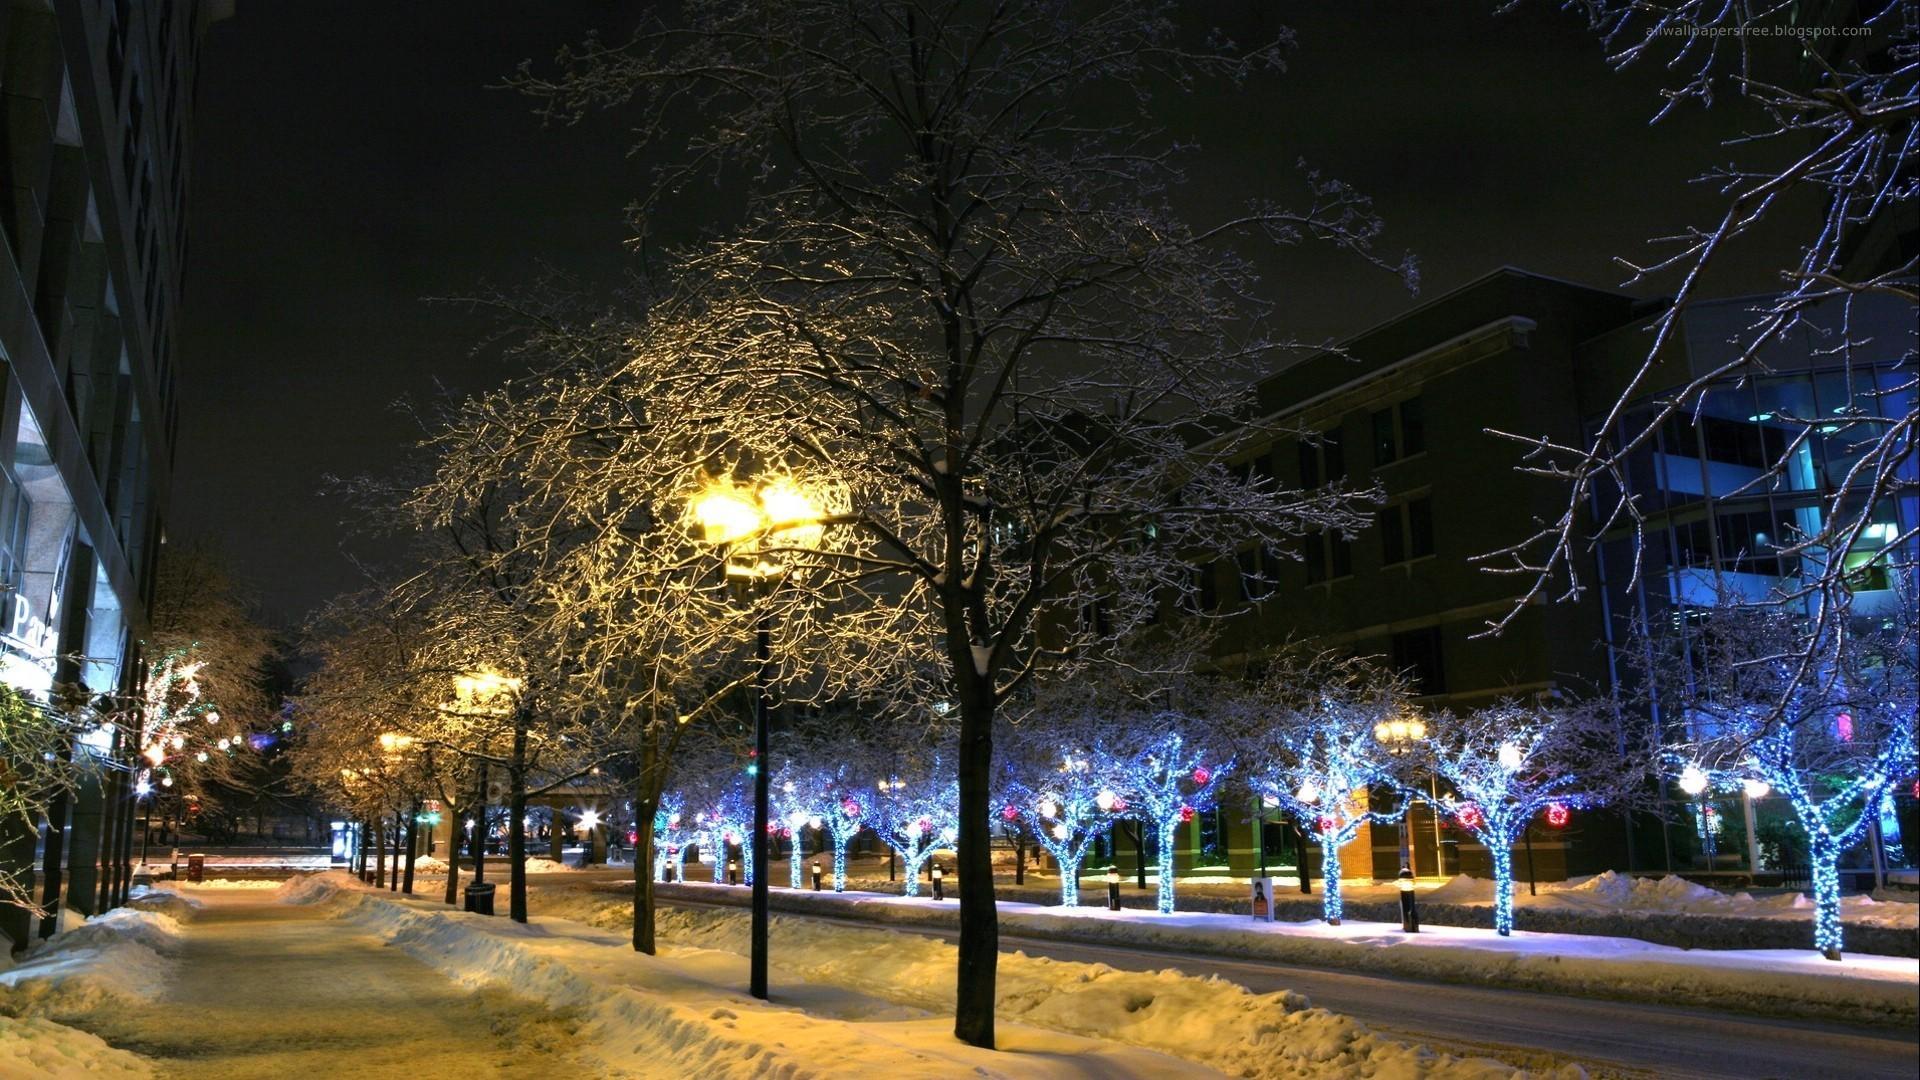 Winter – Night City Late Light Street Christmas Xmas Lights Trees Winter  Desktop Animated Wallpaper Free